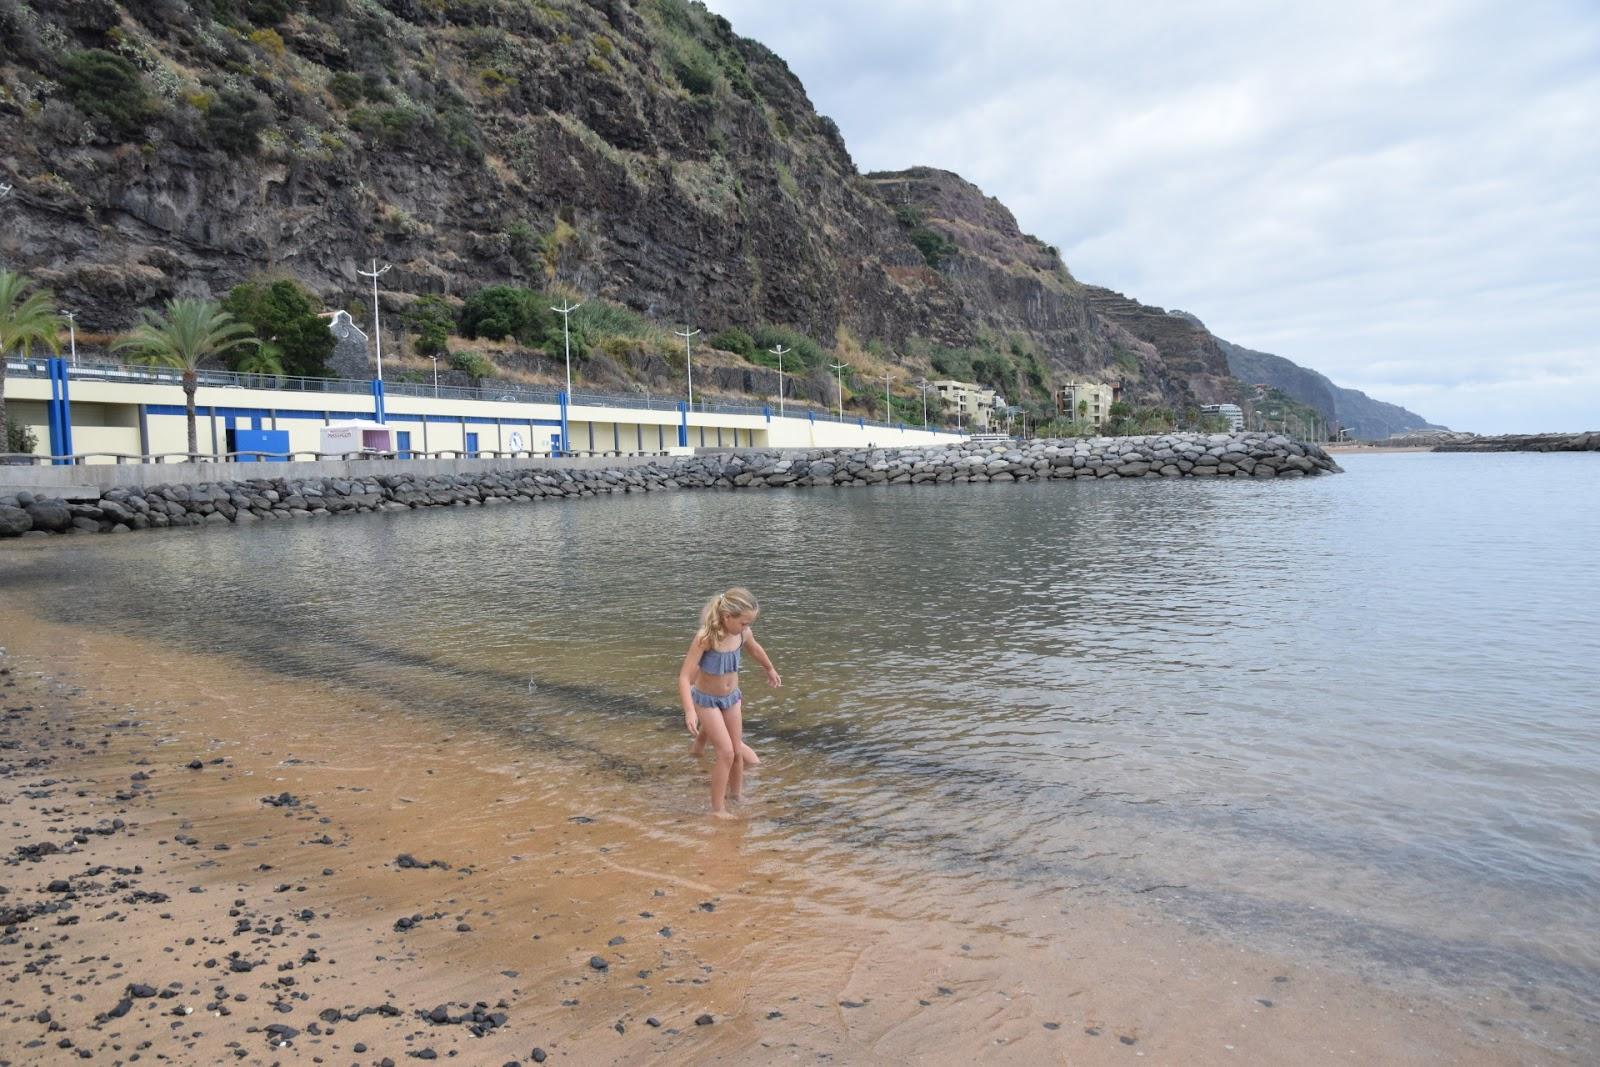 "(<img alt=""Madeira Beaches"">)"